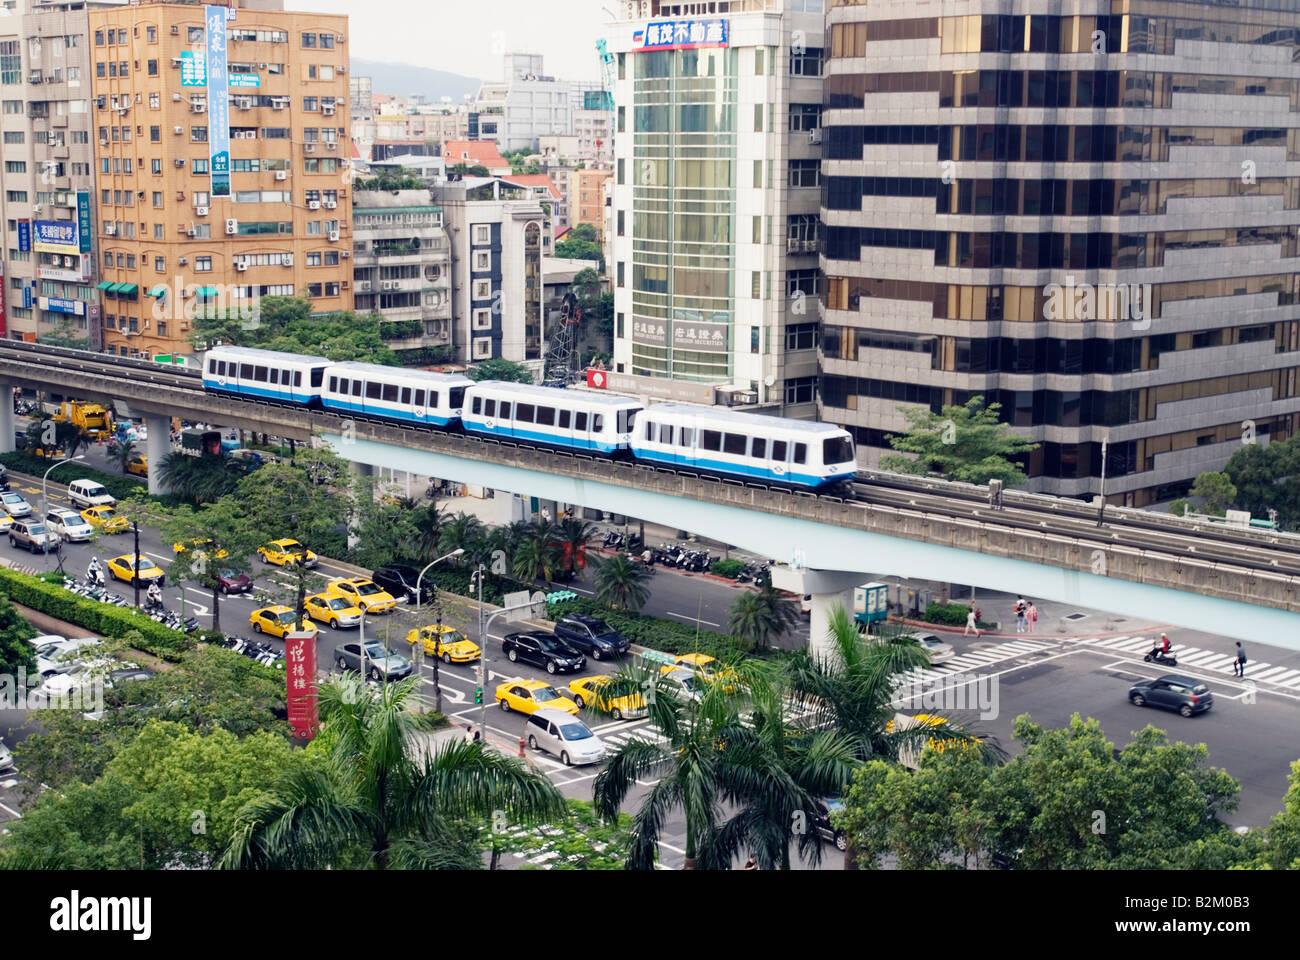 Taiwan, Taipei City, Fuxing Road MRT e traffico Immagini Stock